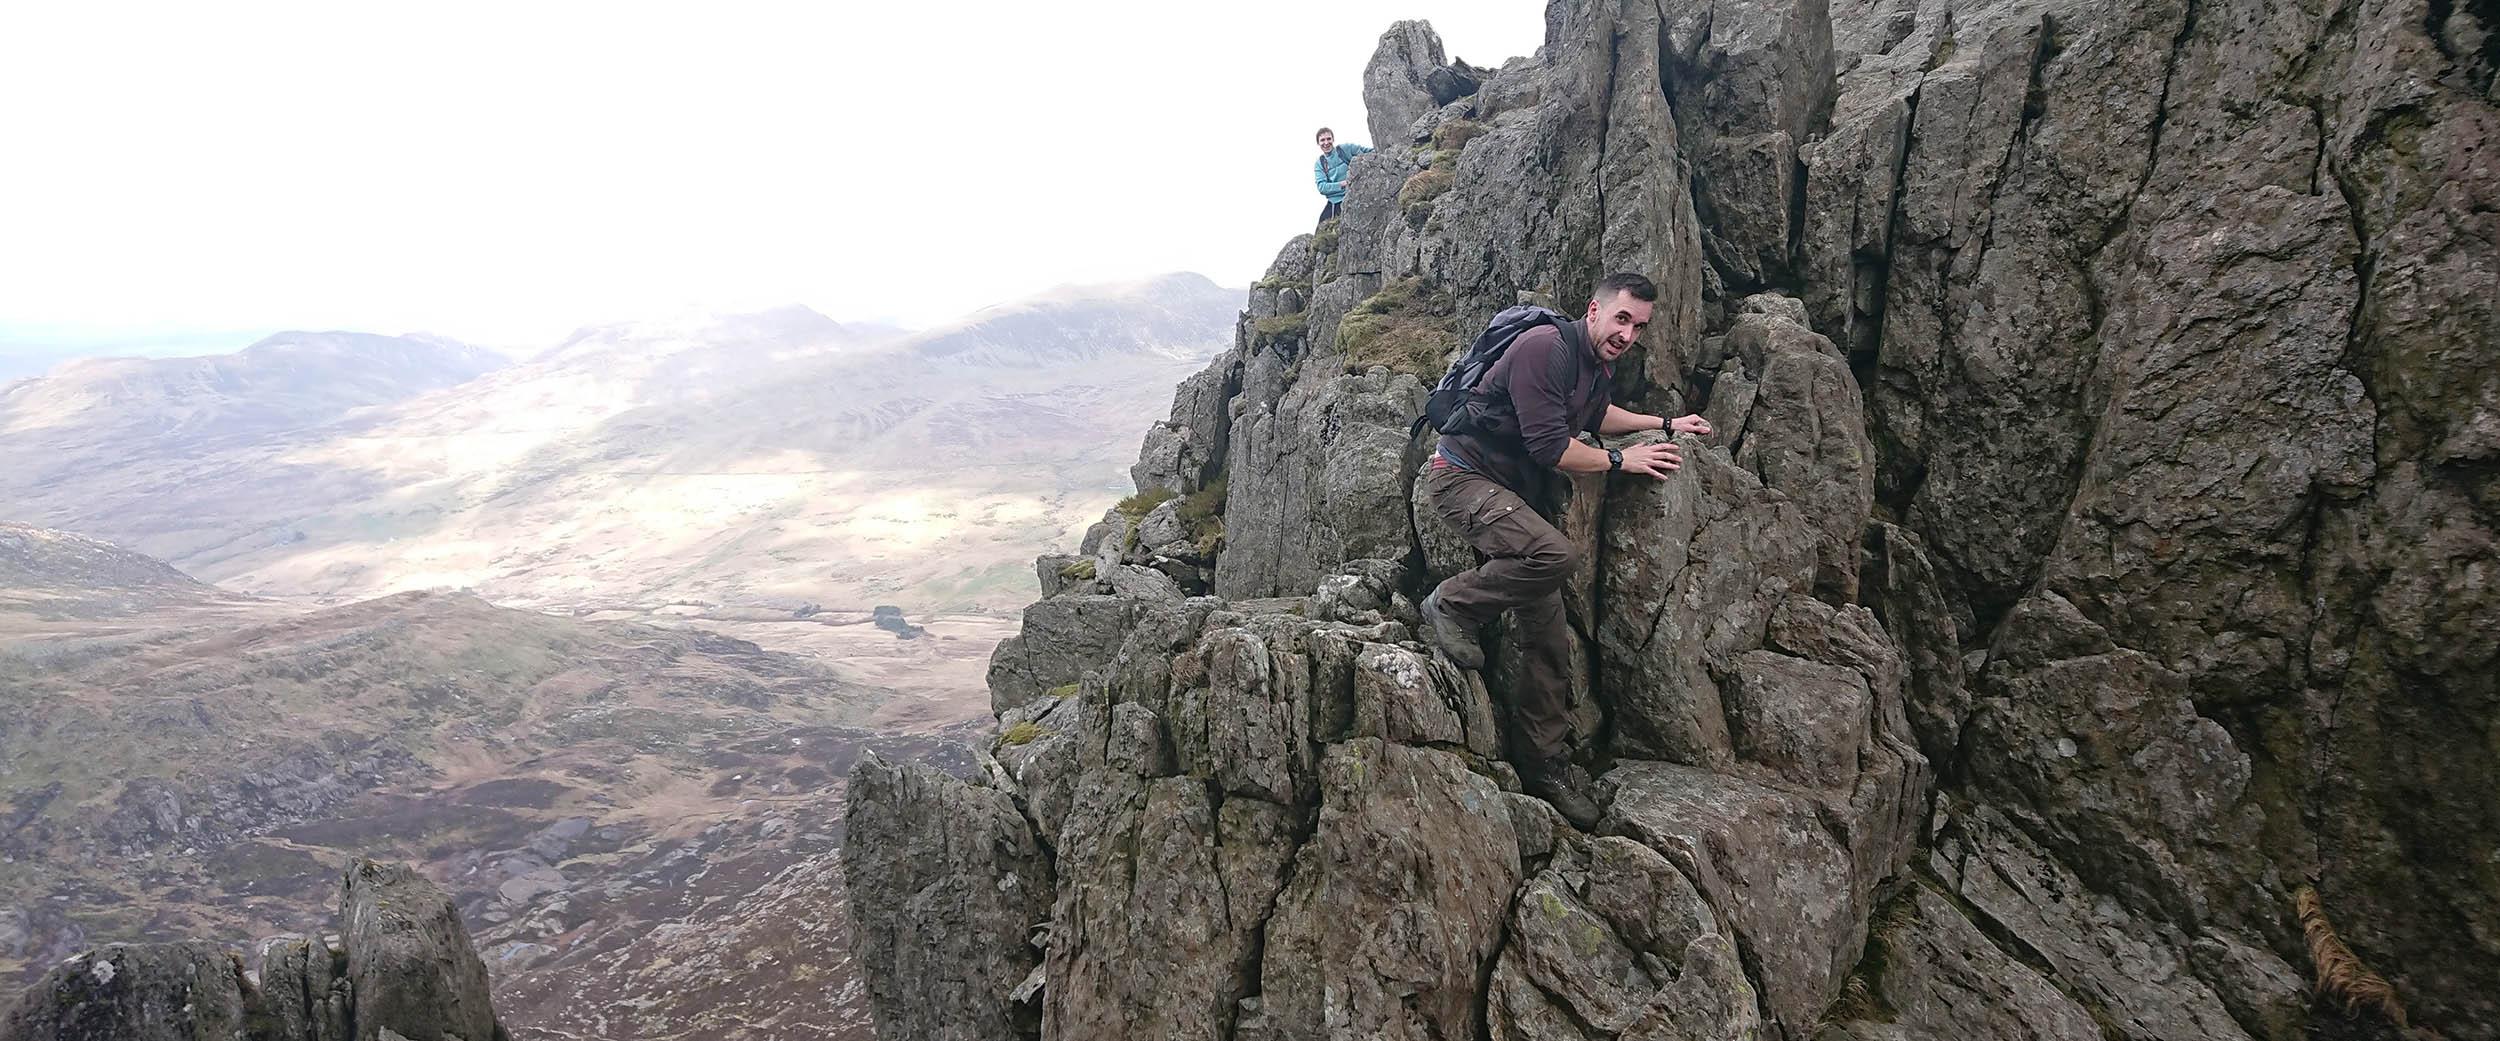 A Scrambler on the Bristly Ridge